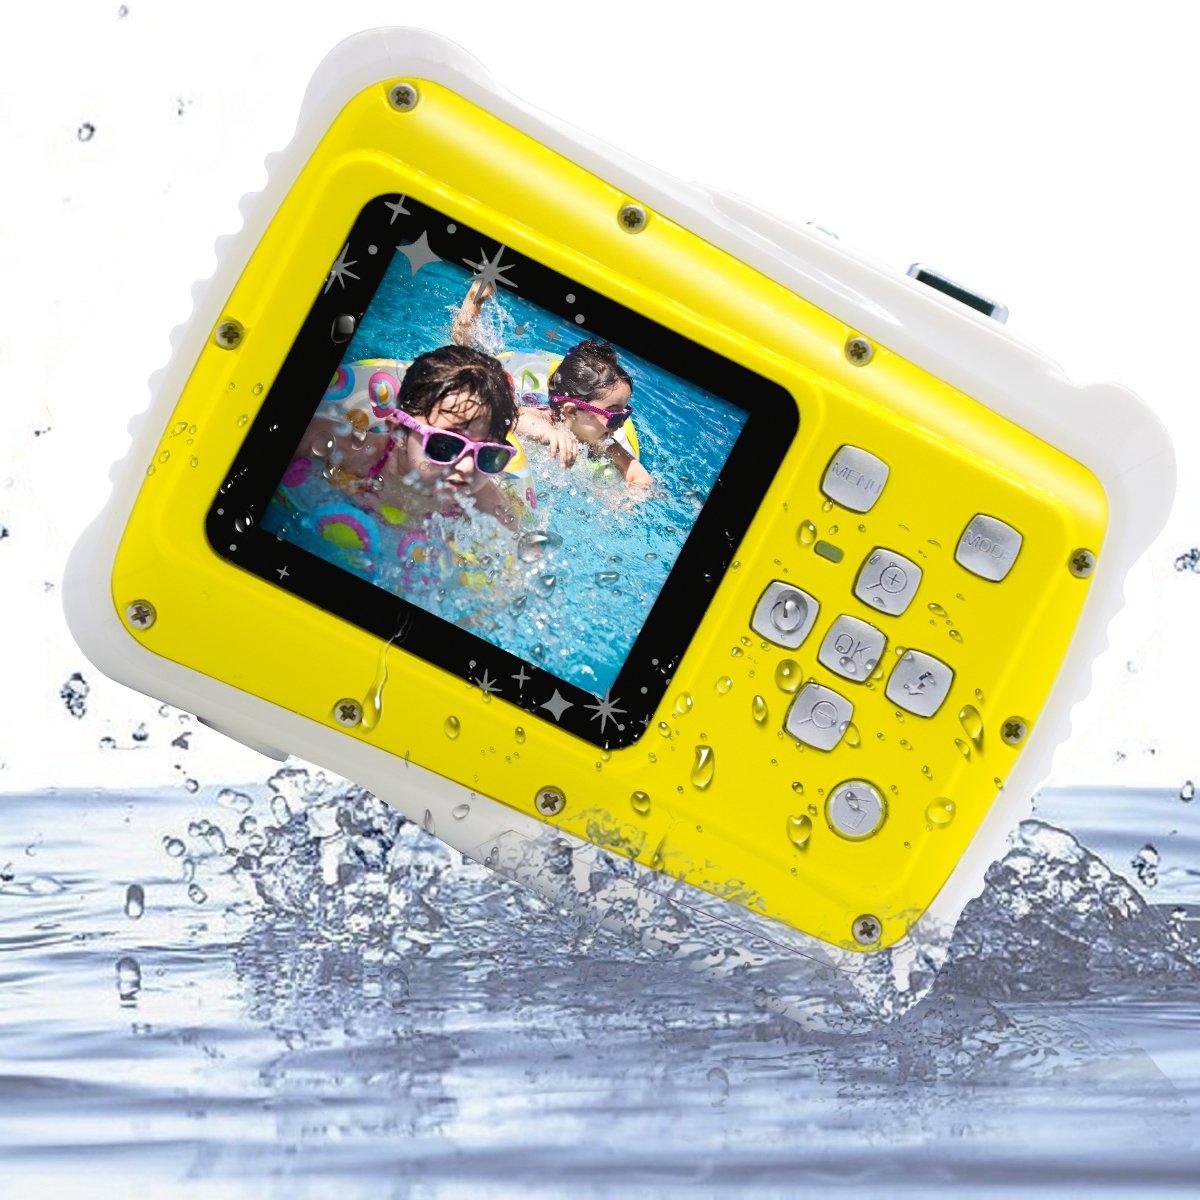 Vmotal Waterproof Digital Camera Camcorder with 8x Digital Zoom 8MP Waterproof Camera for Kids (Yellow)